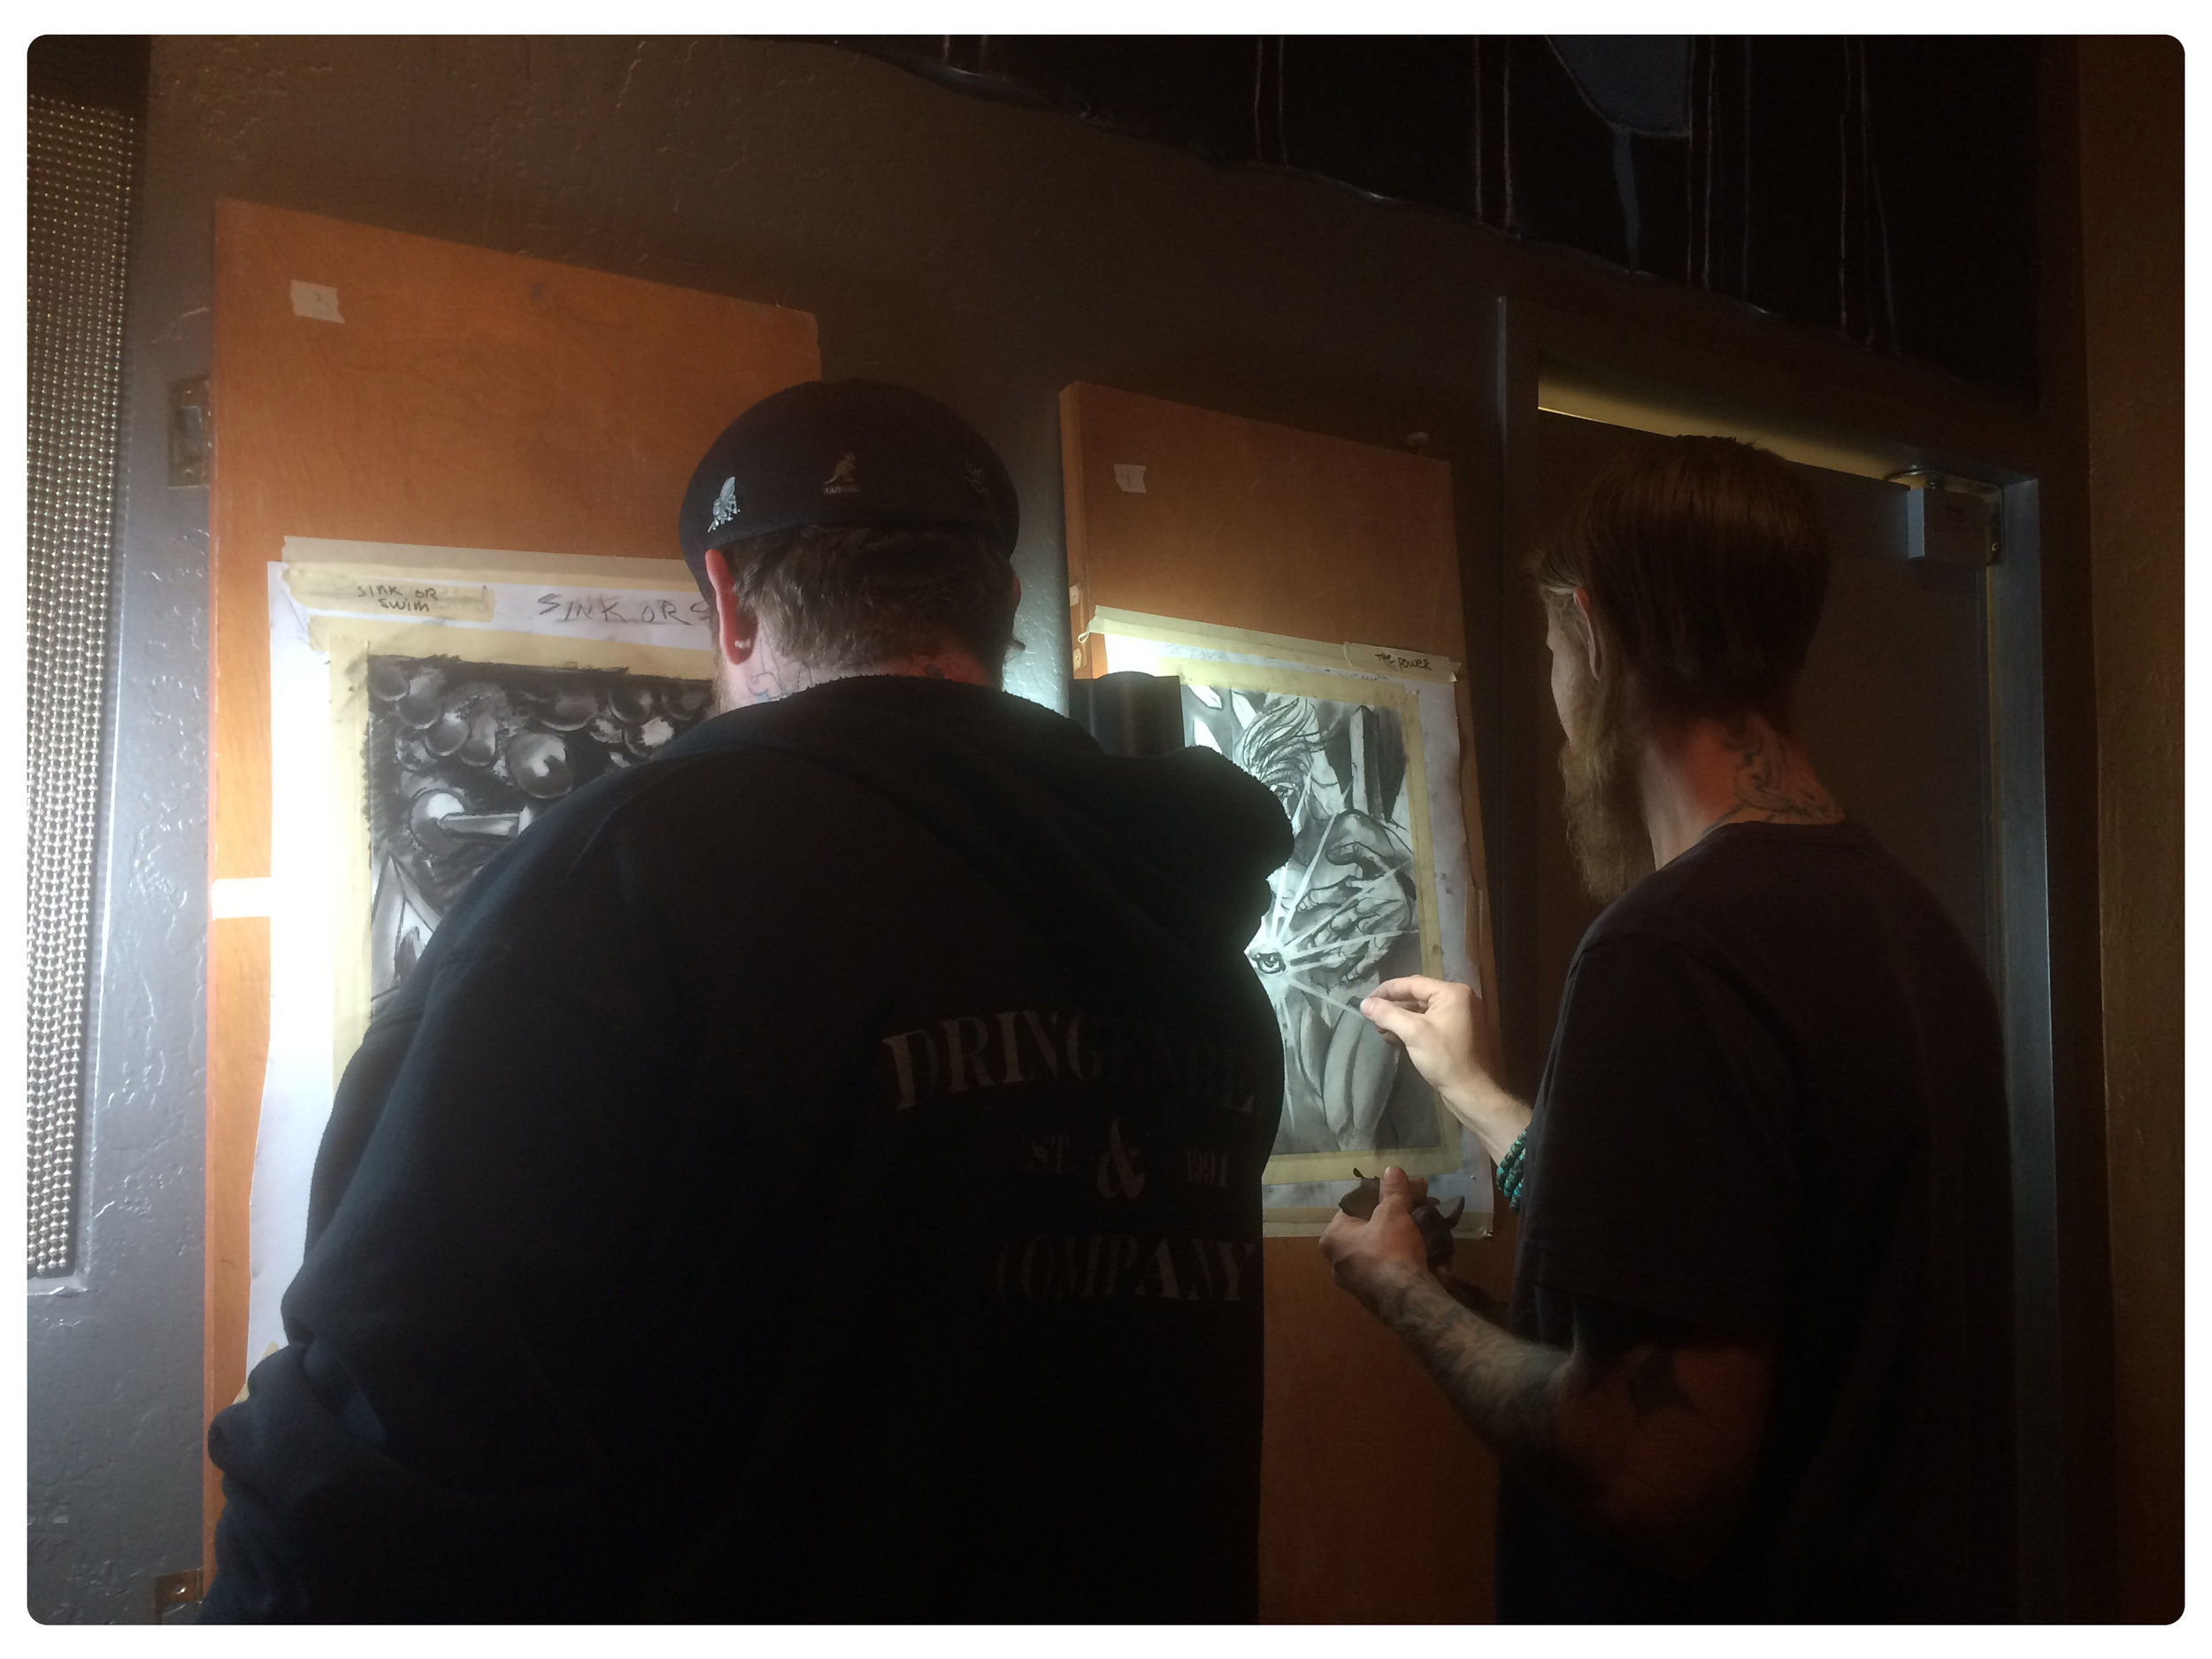 blog_2014_art_live-drawing-event-charcoal.jpg